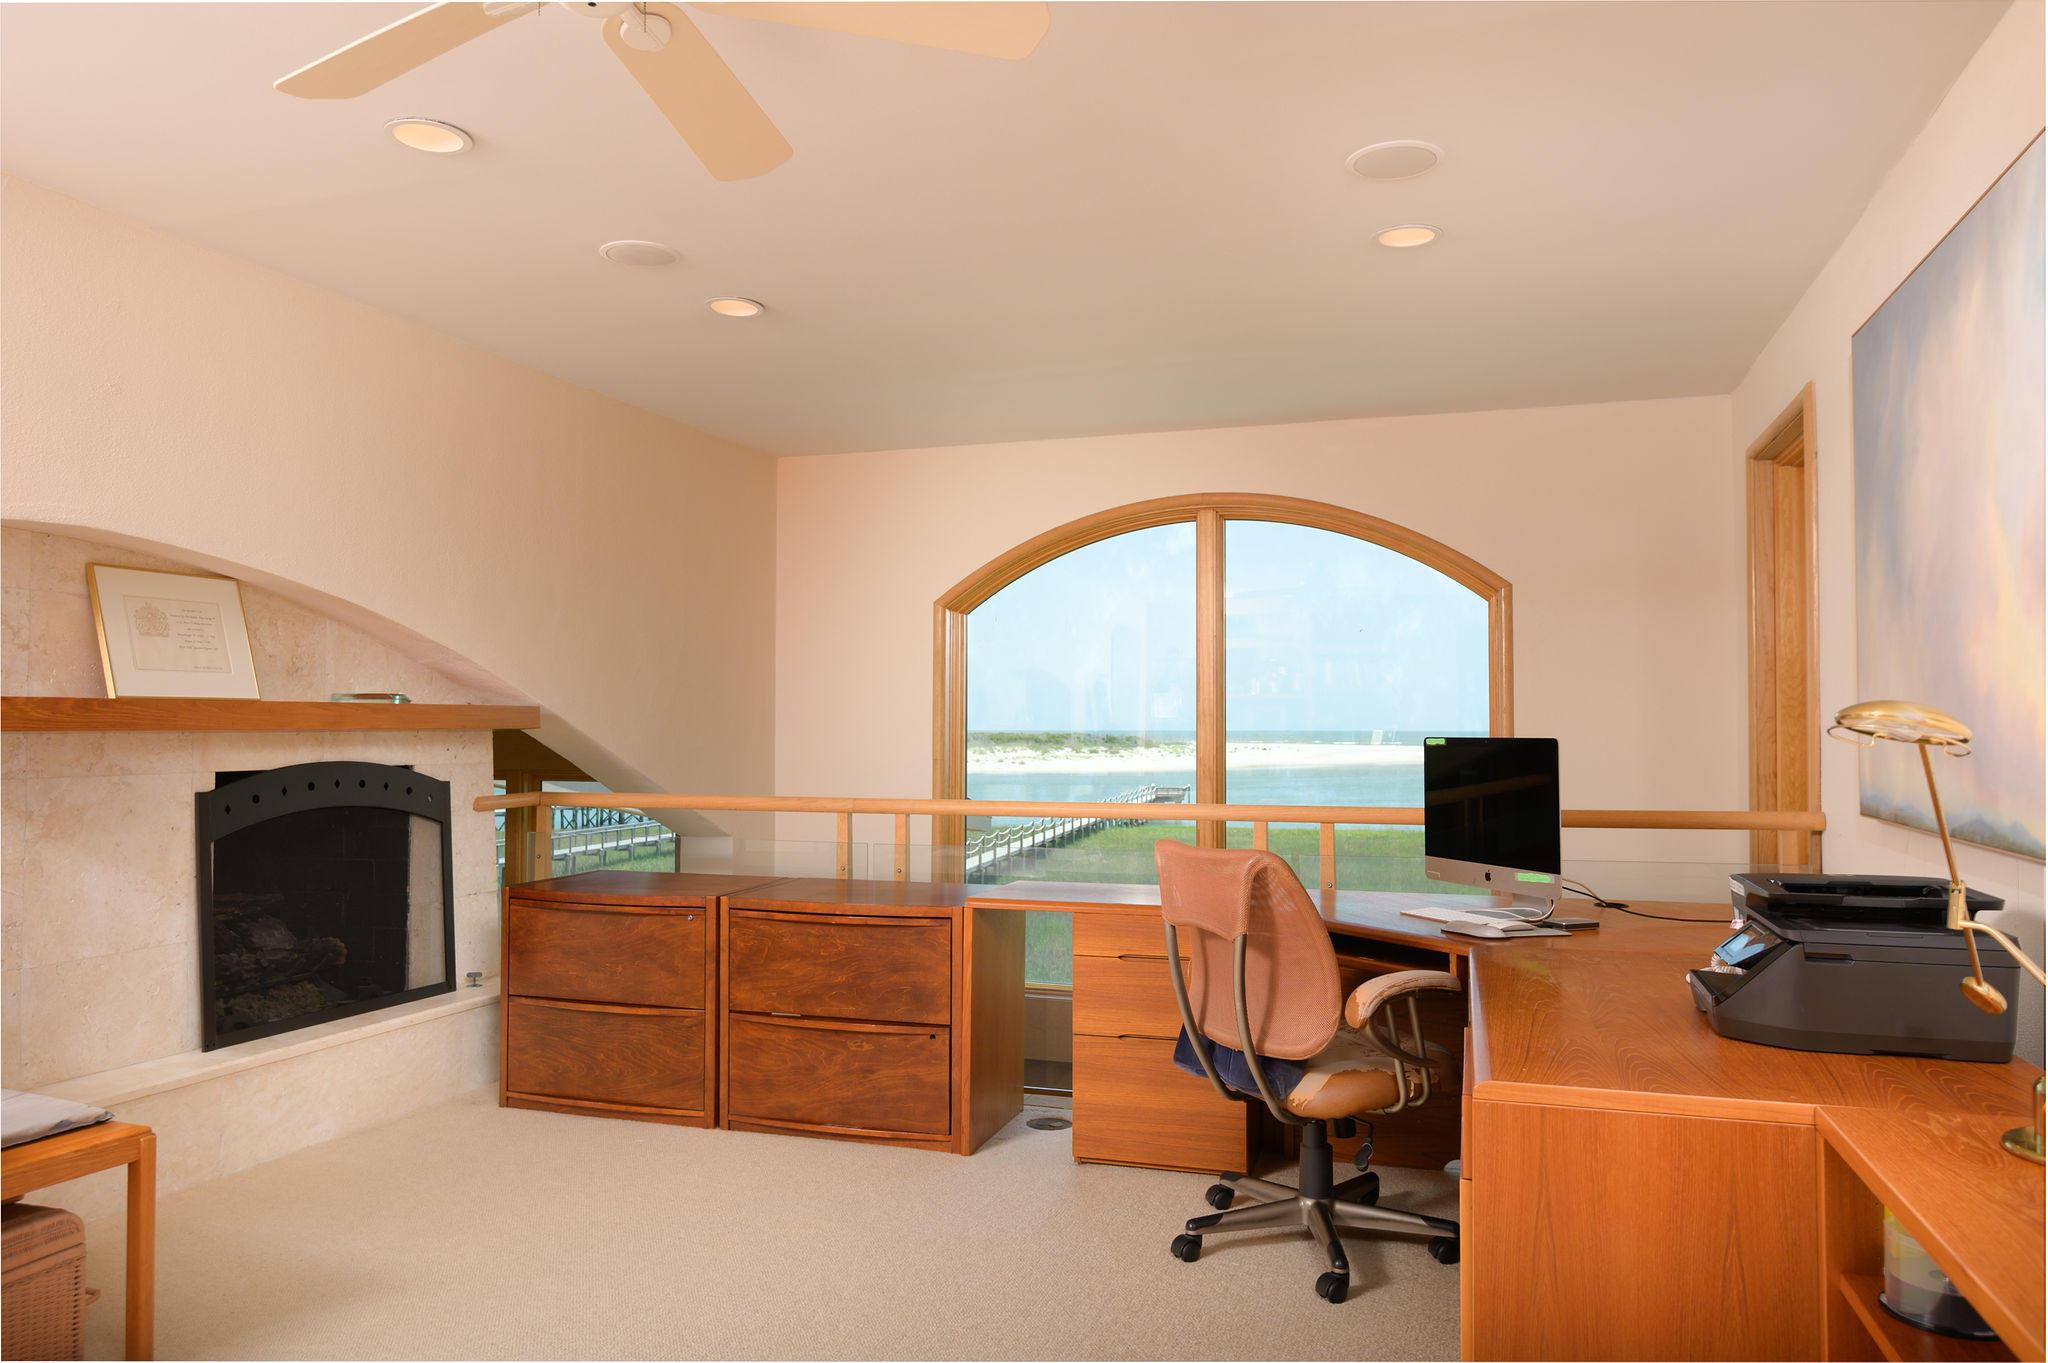 Seabrook Island Homes For Sale - 3087 Marshgate, Seabrook Island, SC - 7